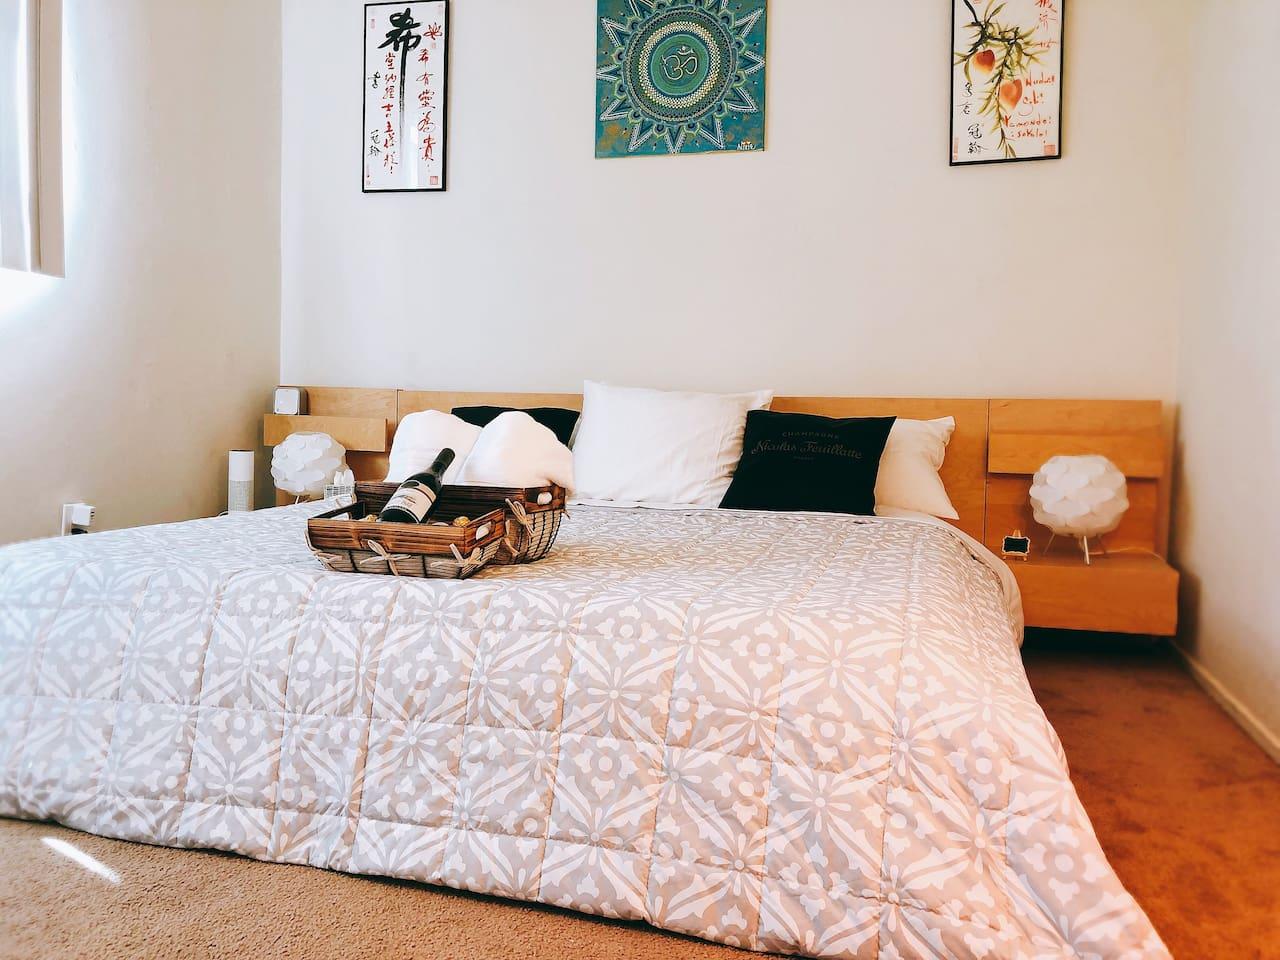 Bedroom 1 with Ba. California King Tempurpedic Mattress